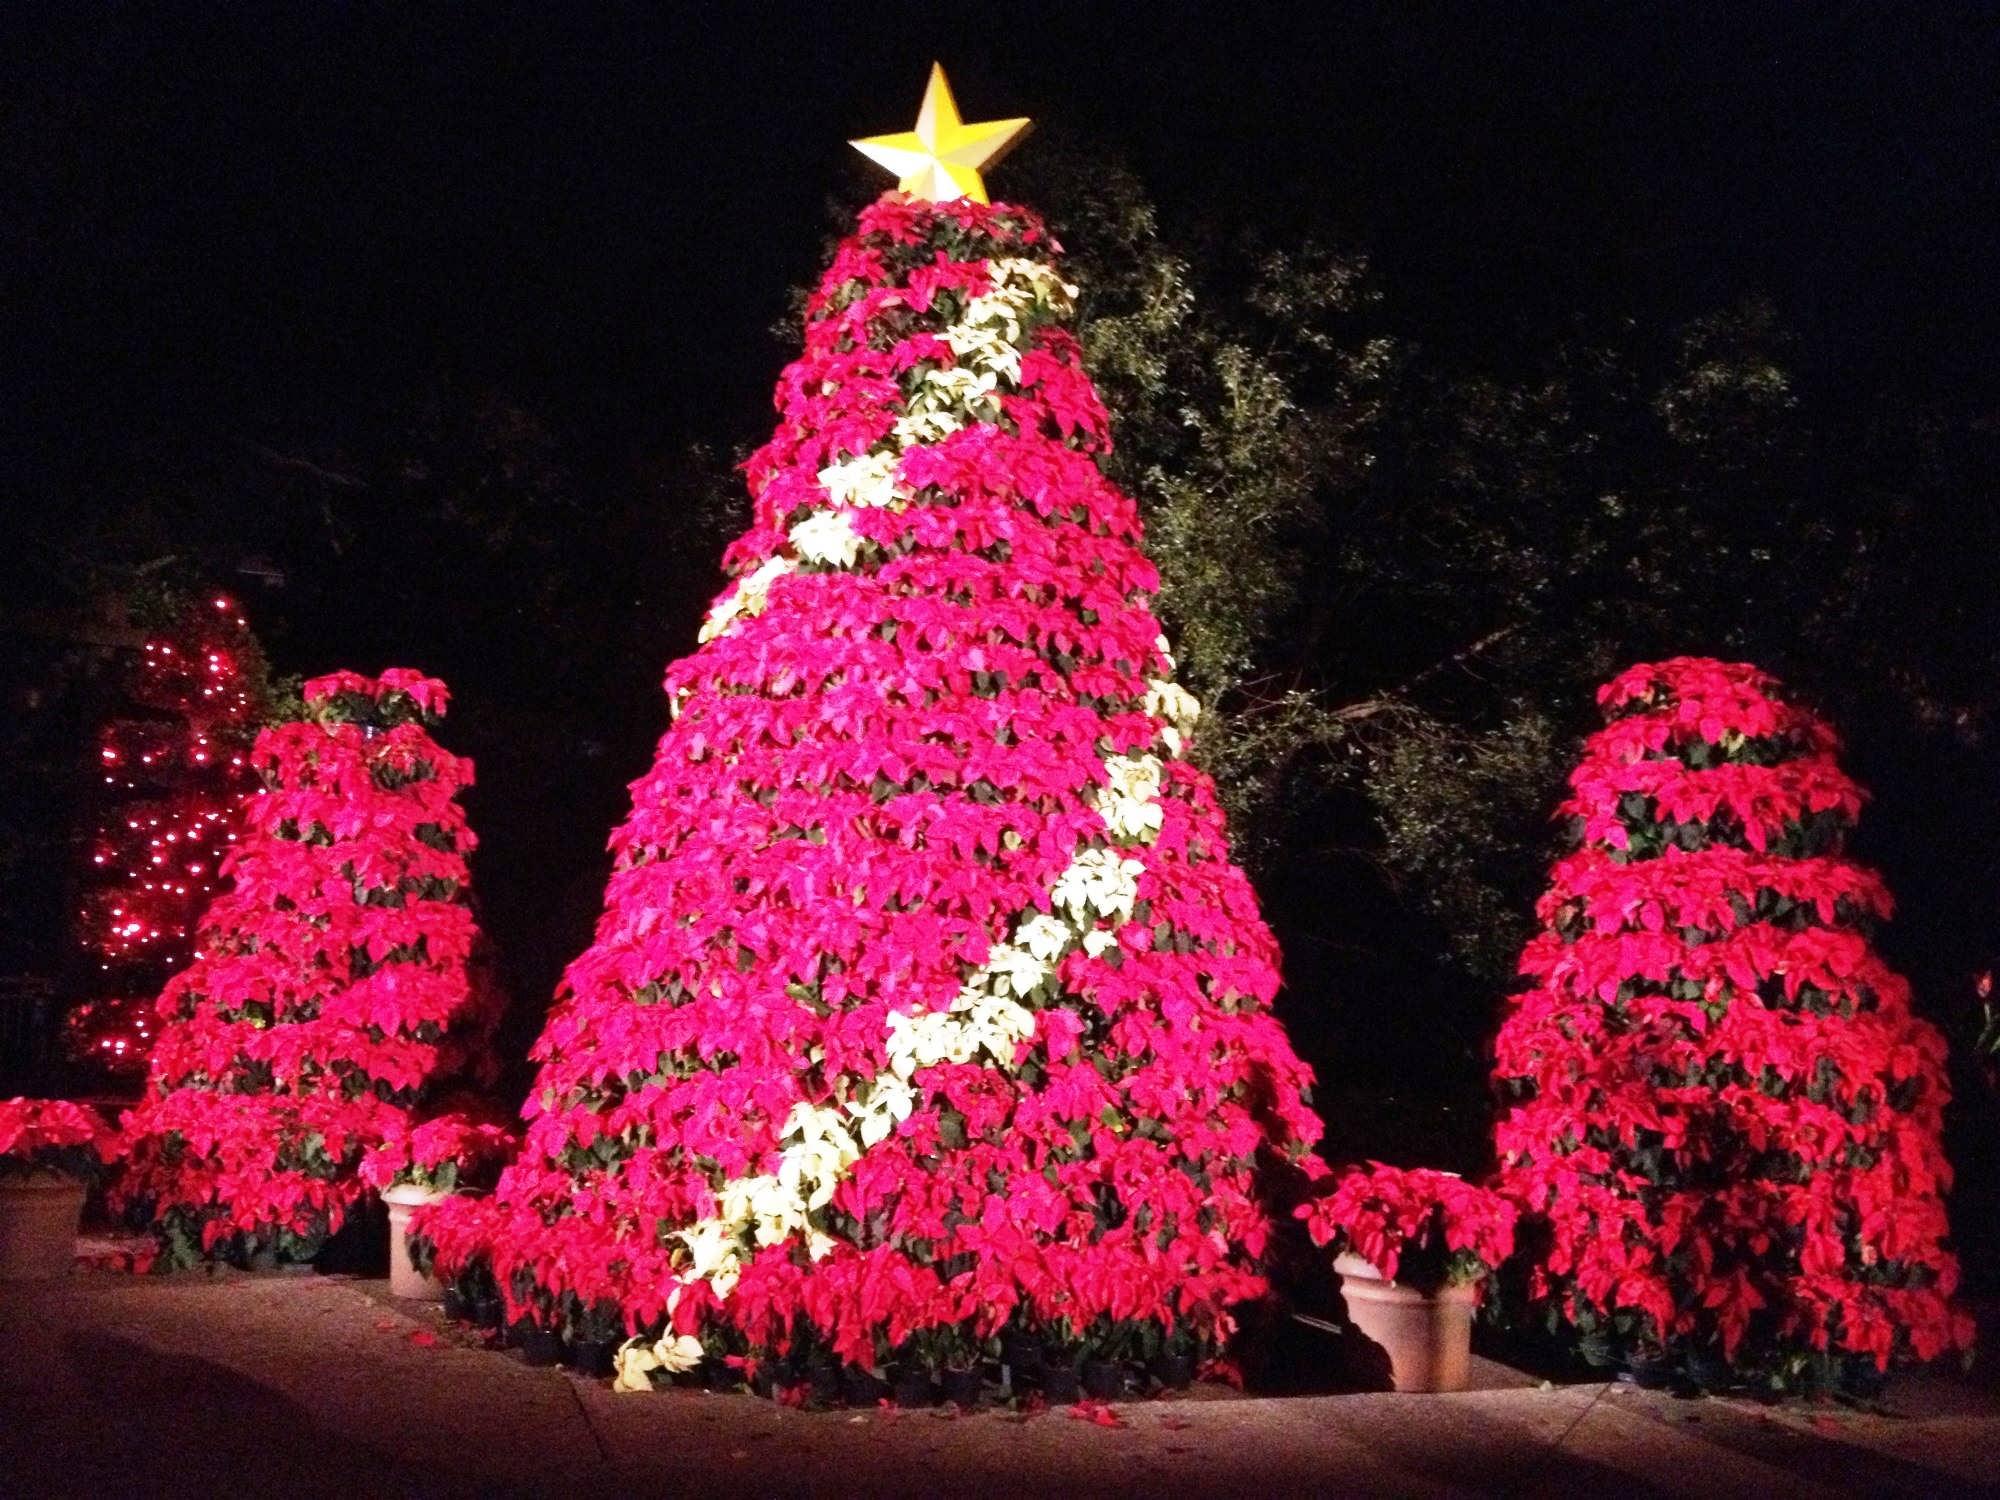 Christmas Town at Busch Gardens: A new